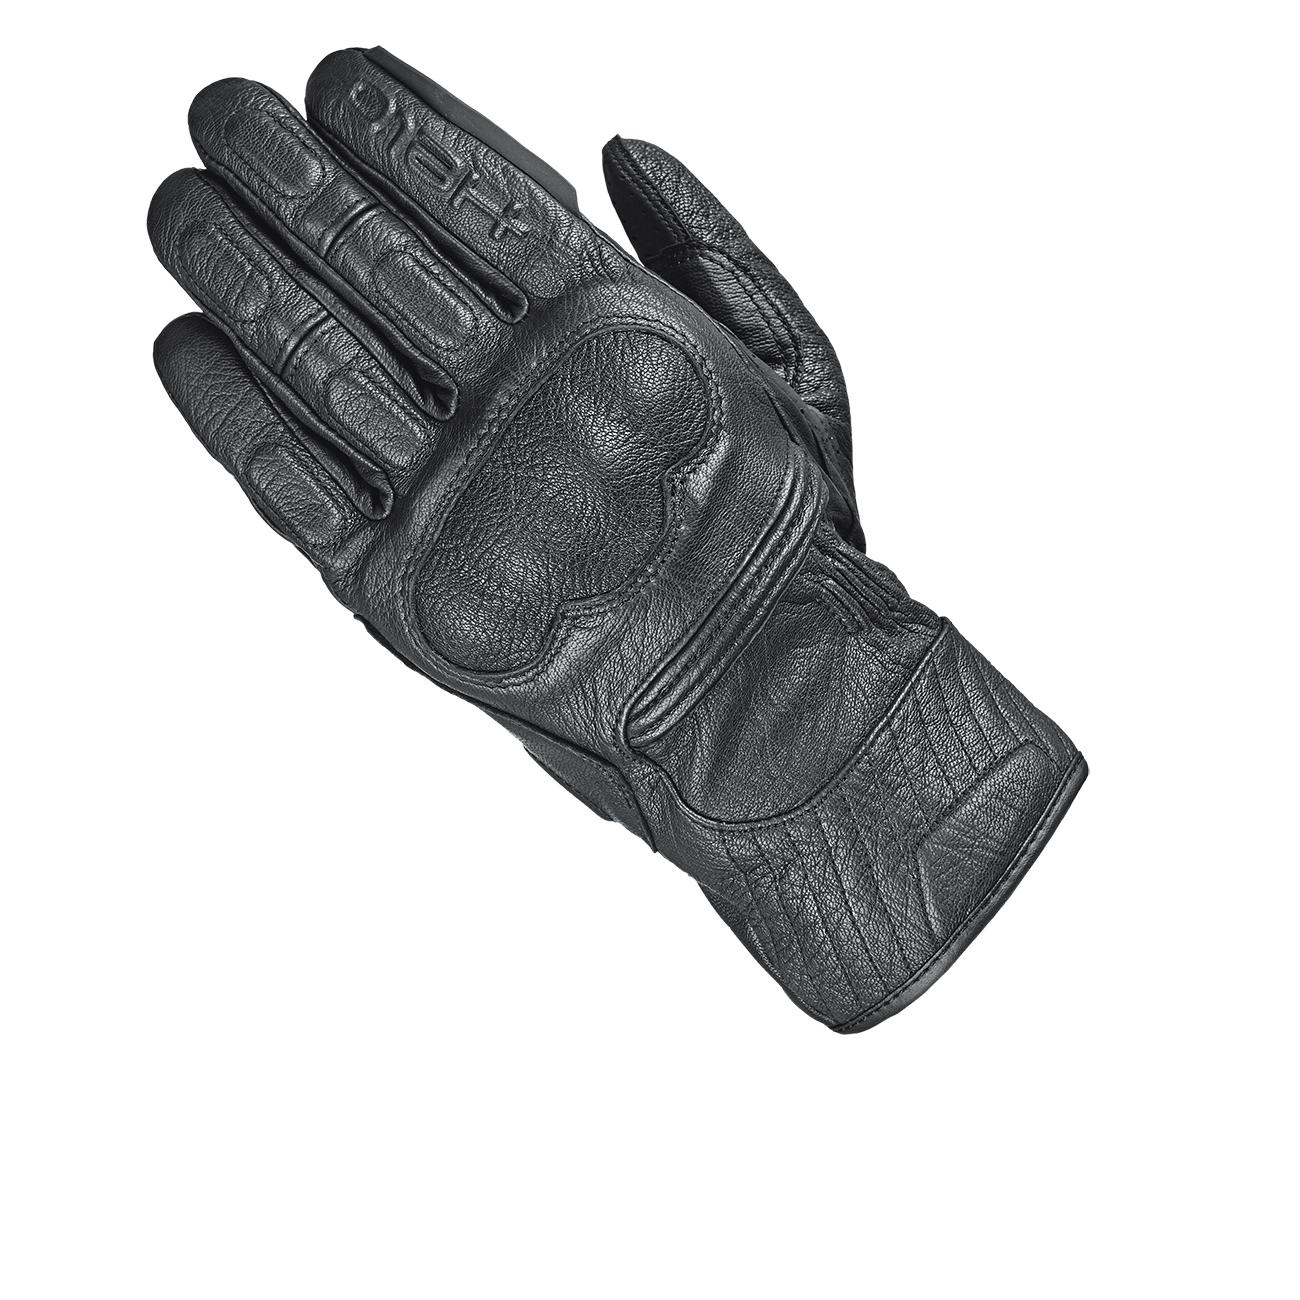 Gants Held Curt noir - 8